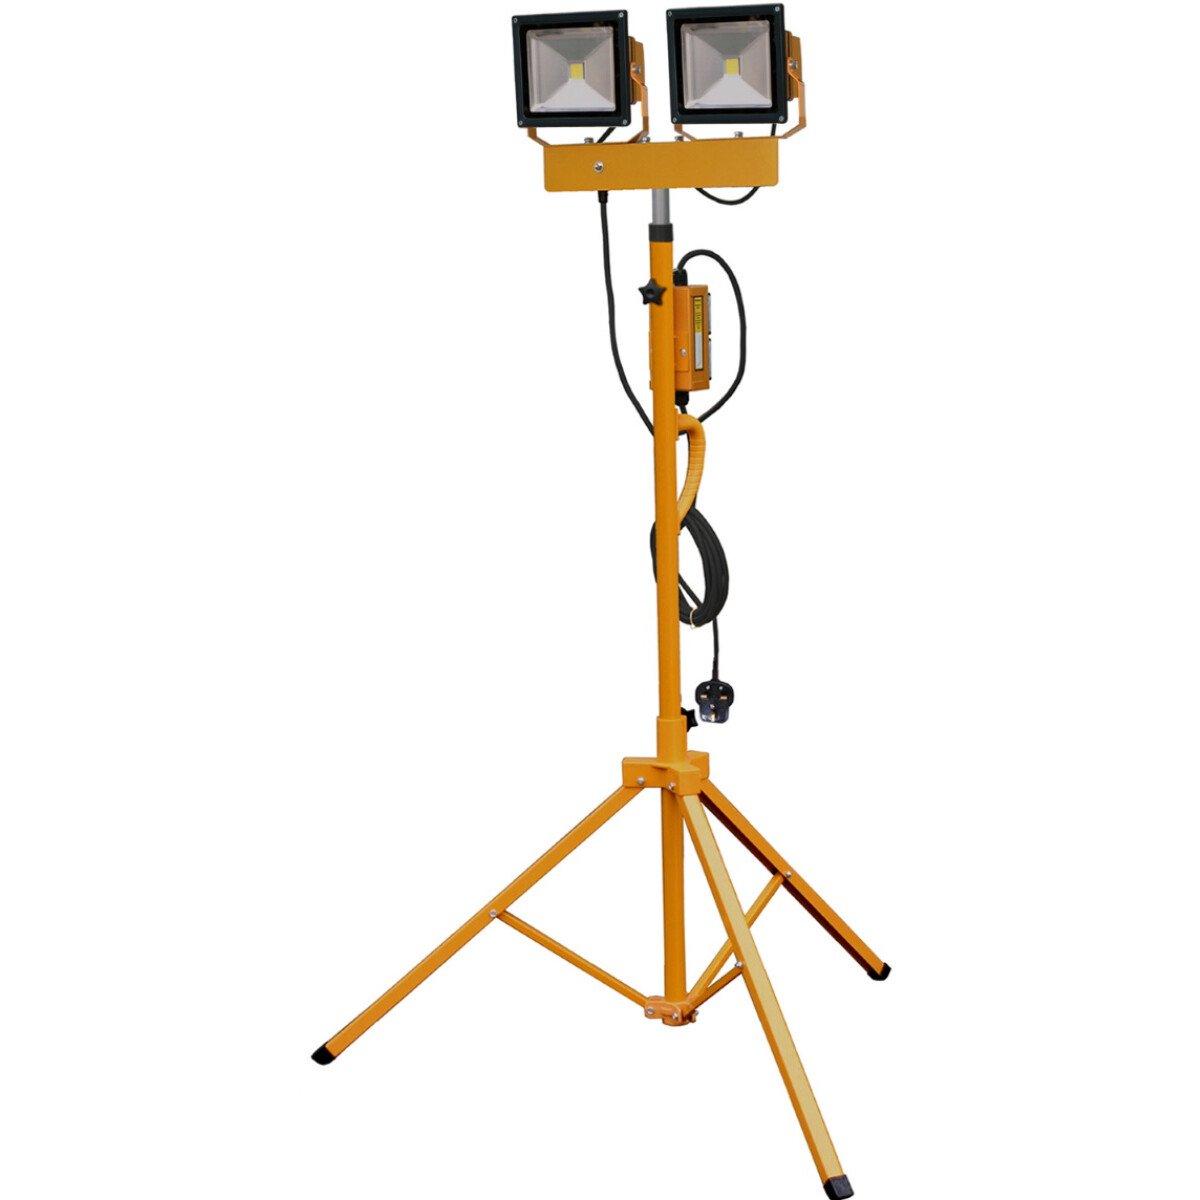 Spectre SP-17187 230V HD Twin 30W COB LED Floodlight Work Light